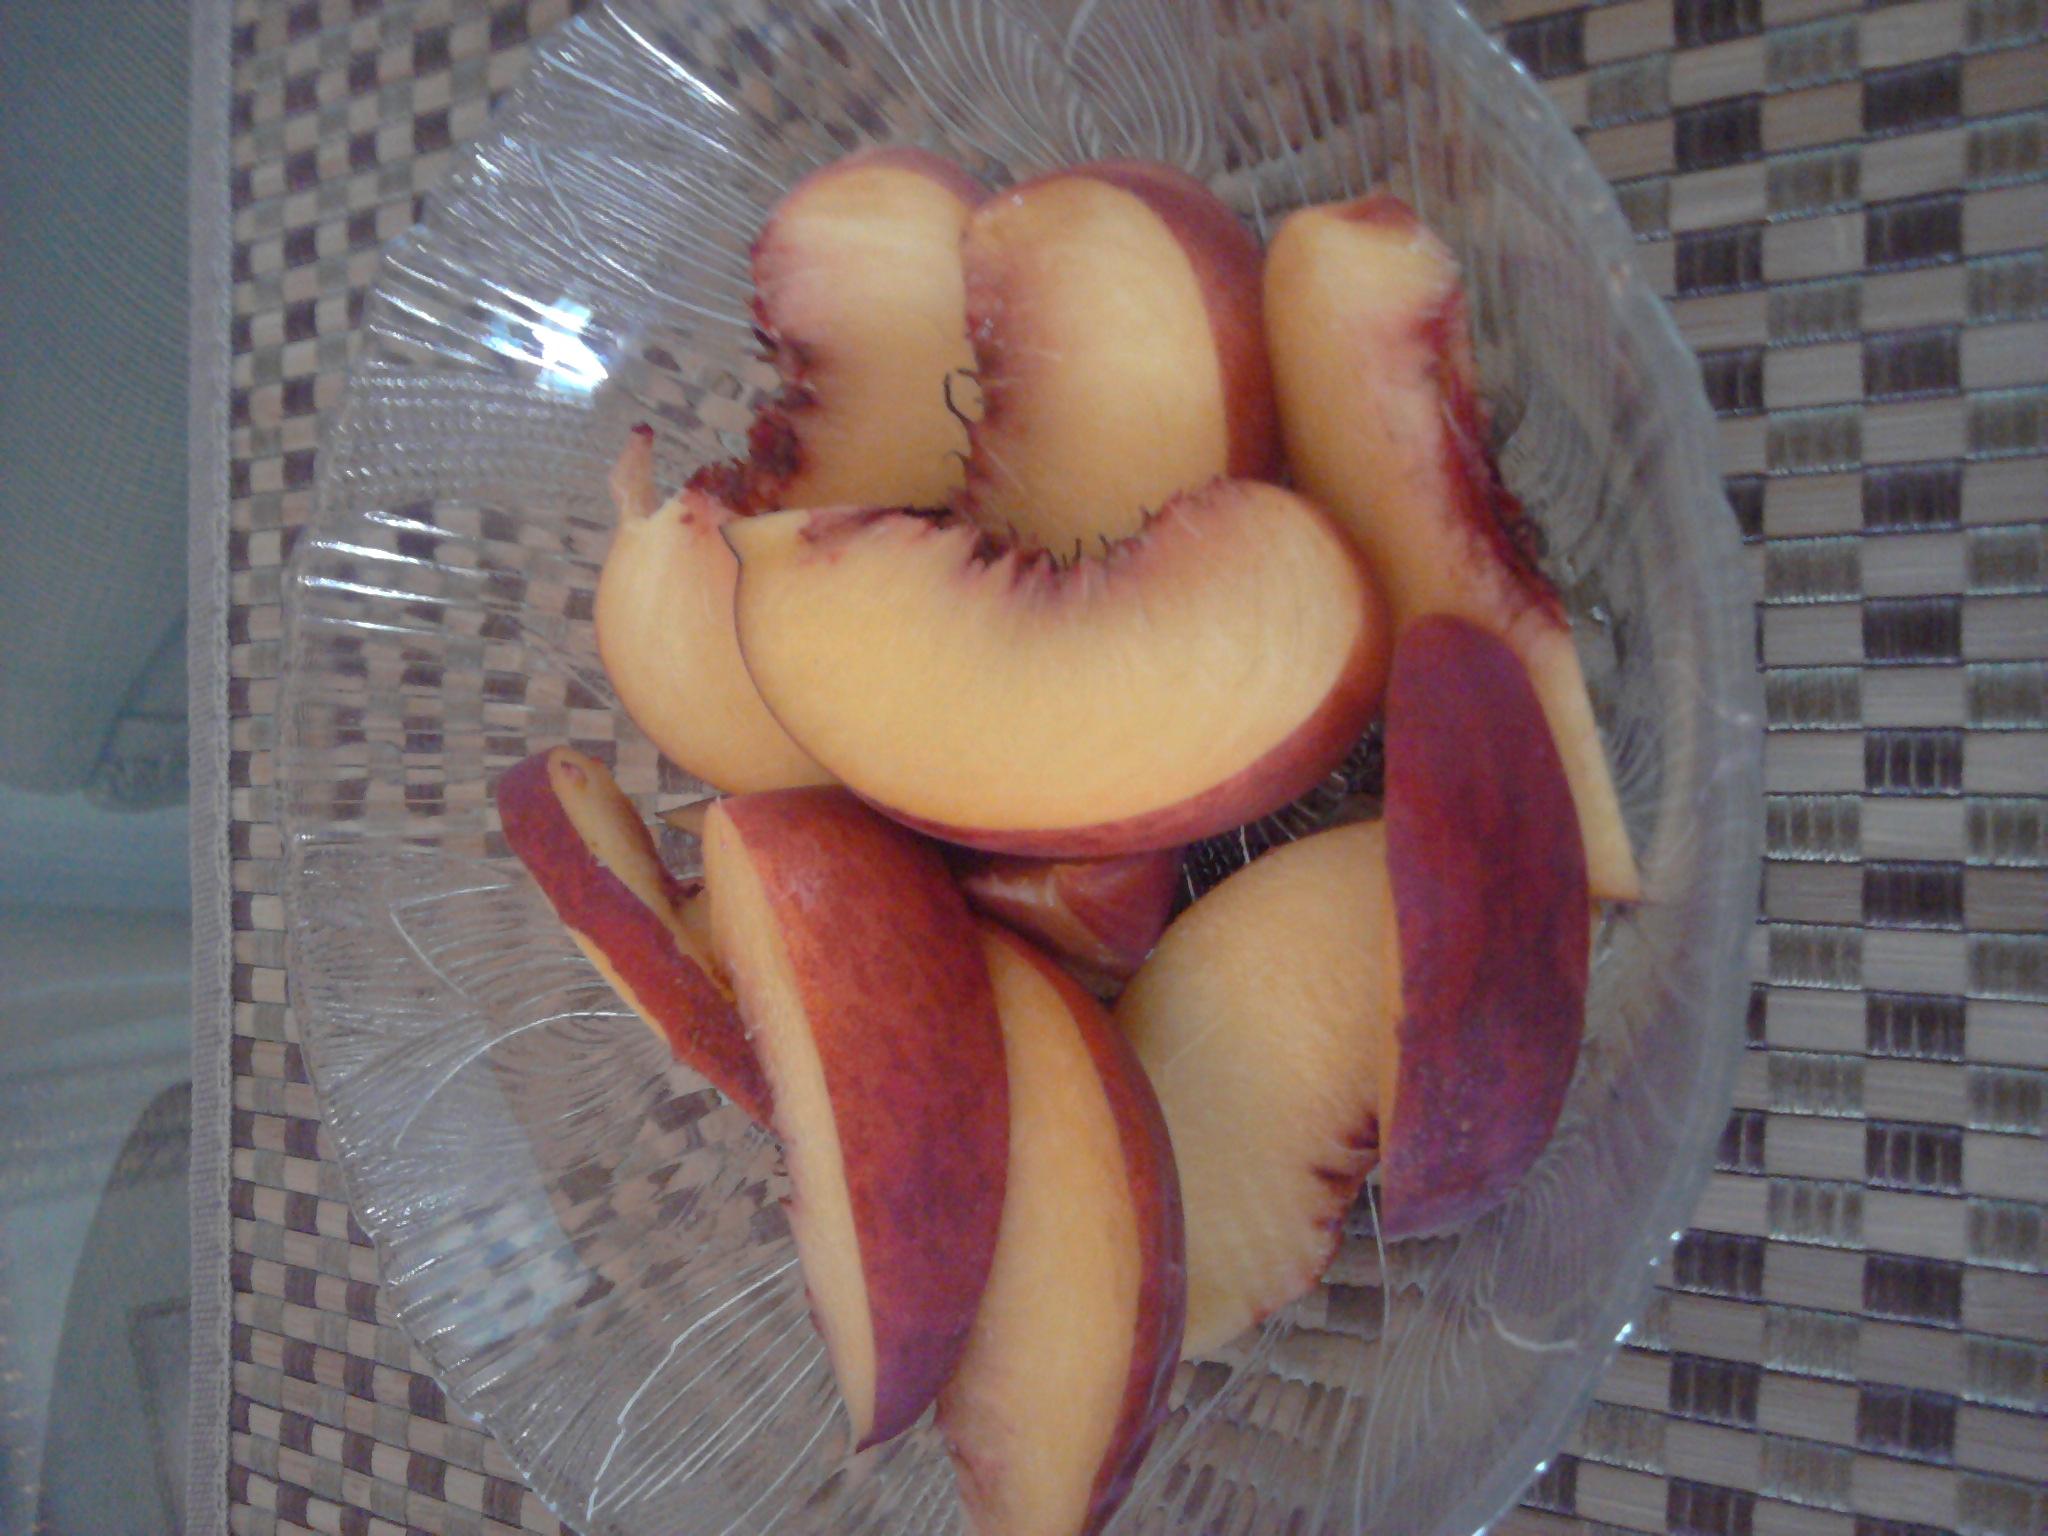 La Joya t.x. :: fresh diced peaches